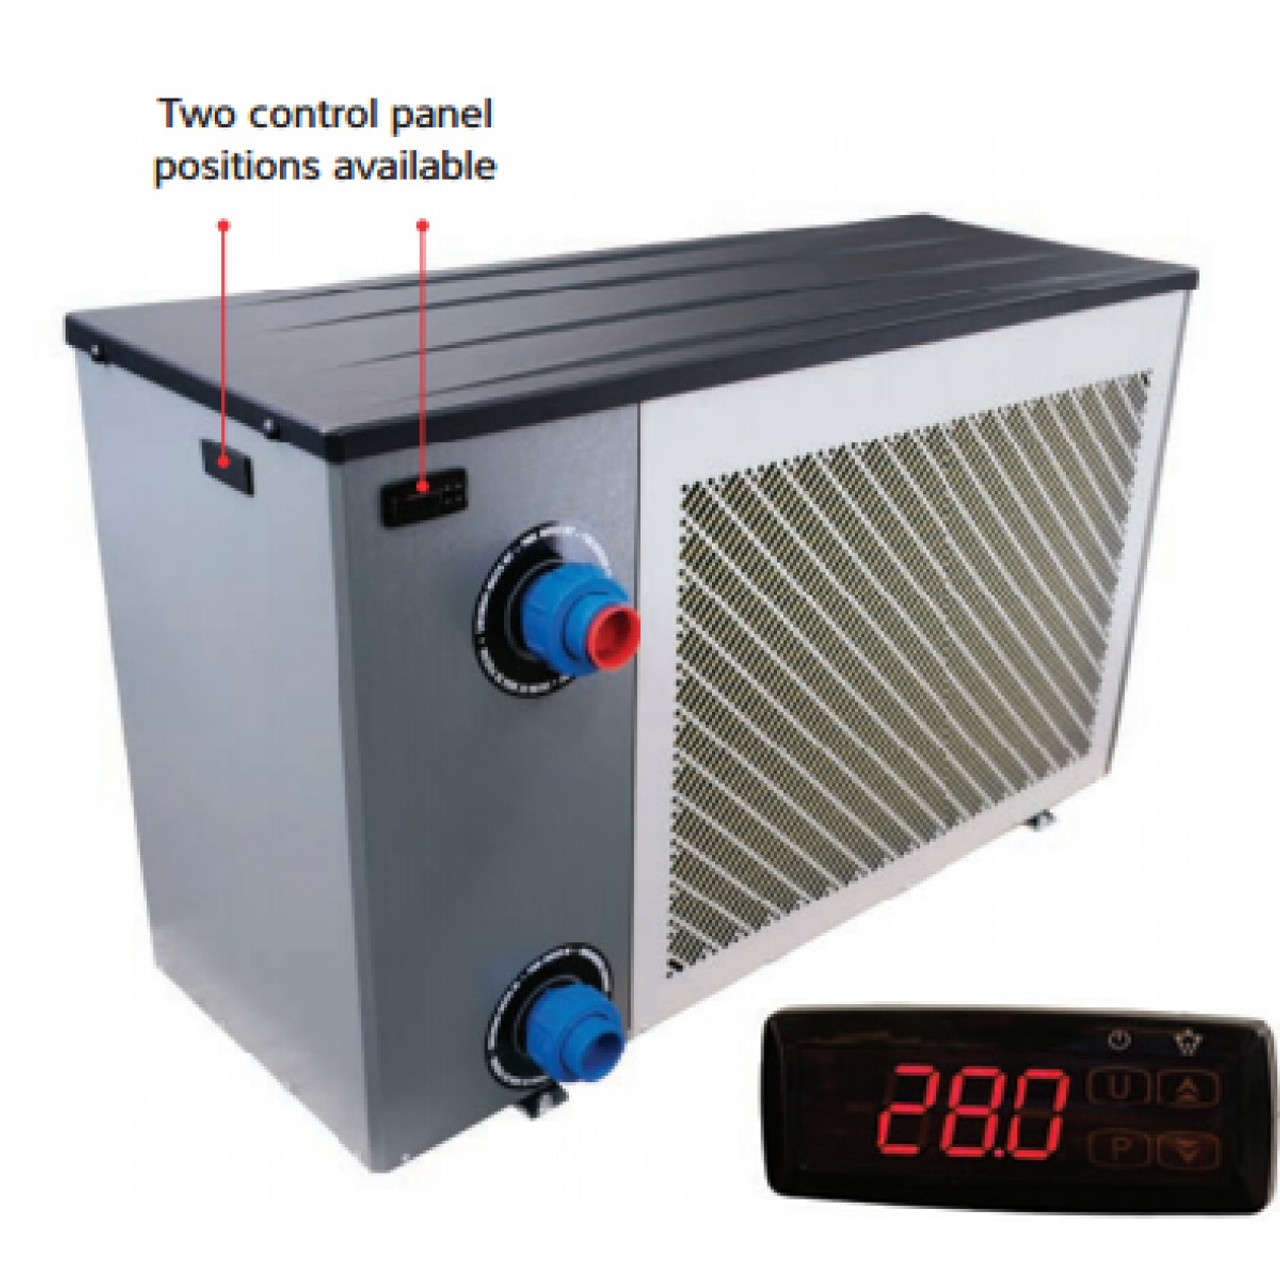 Calorex pro pac domestic swimming pool heat pump